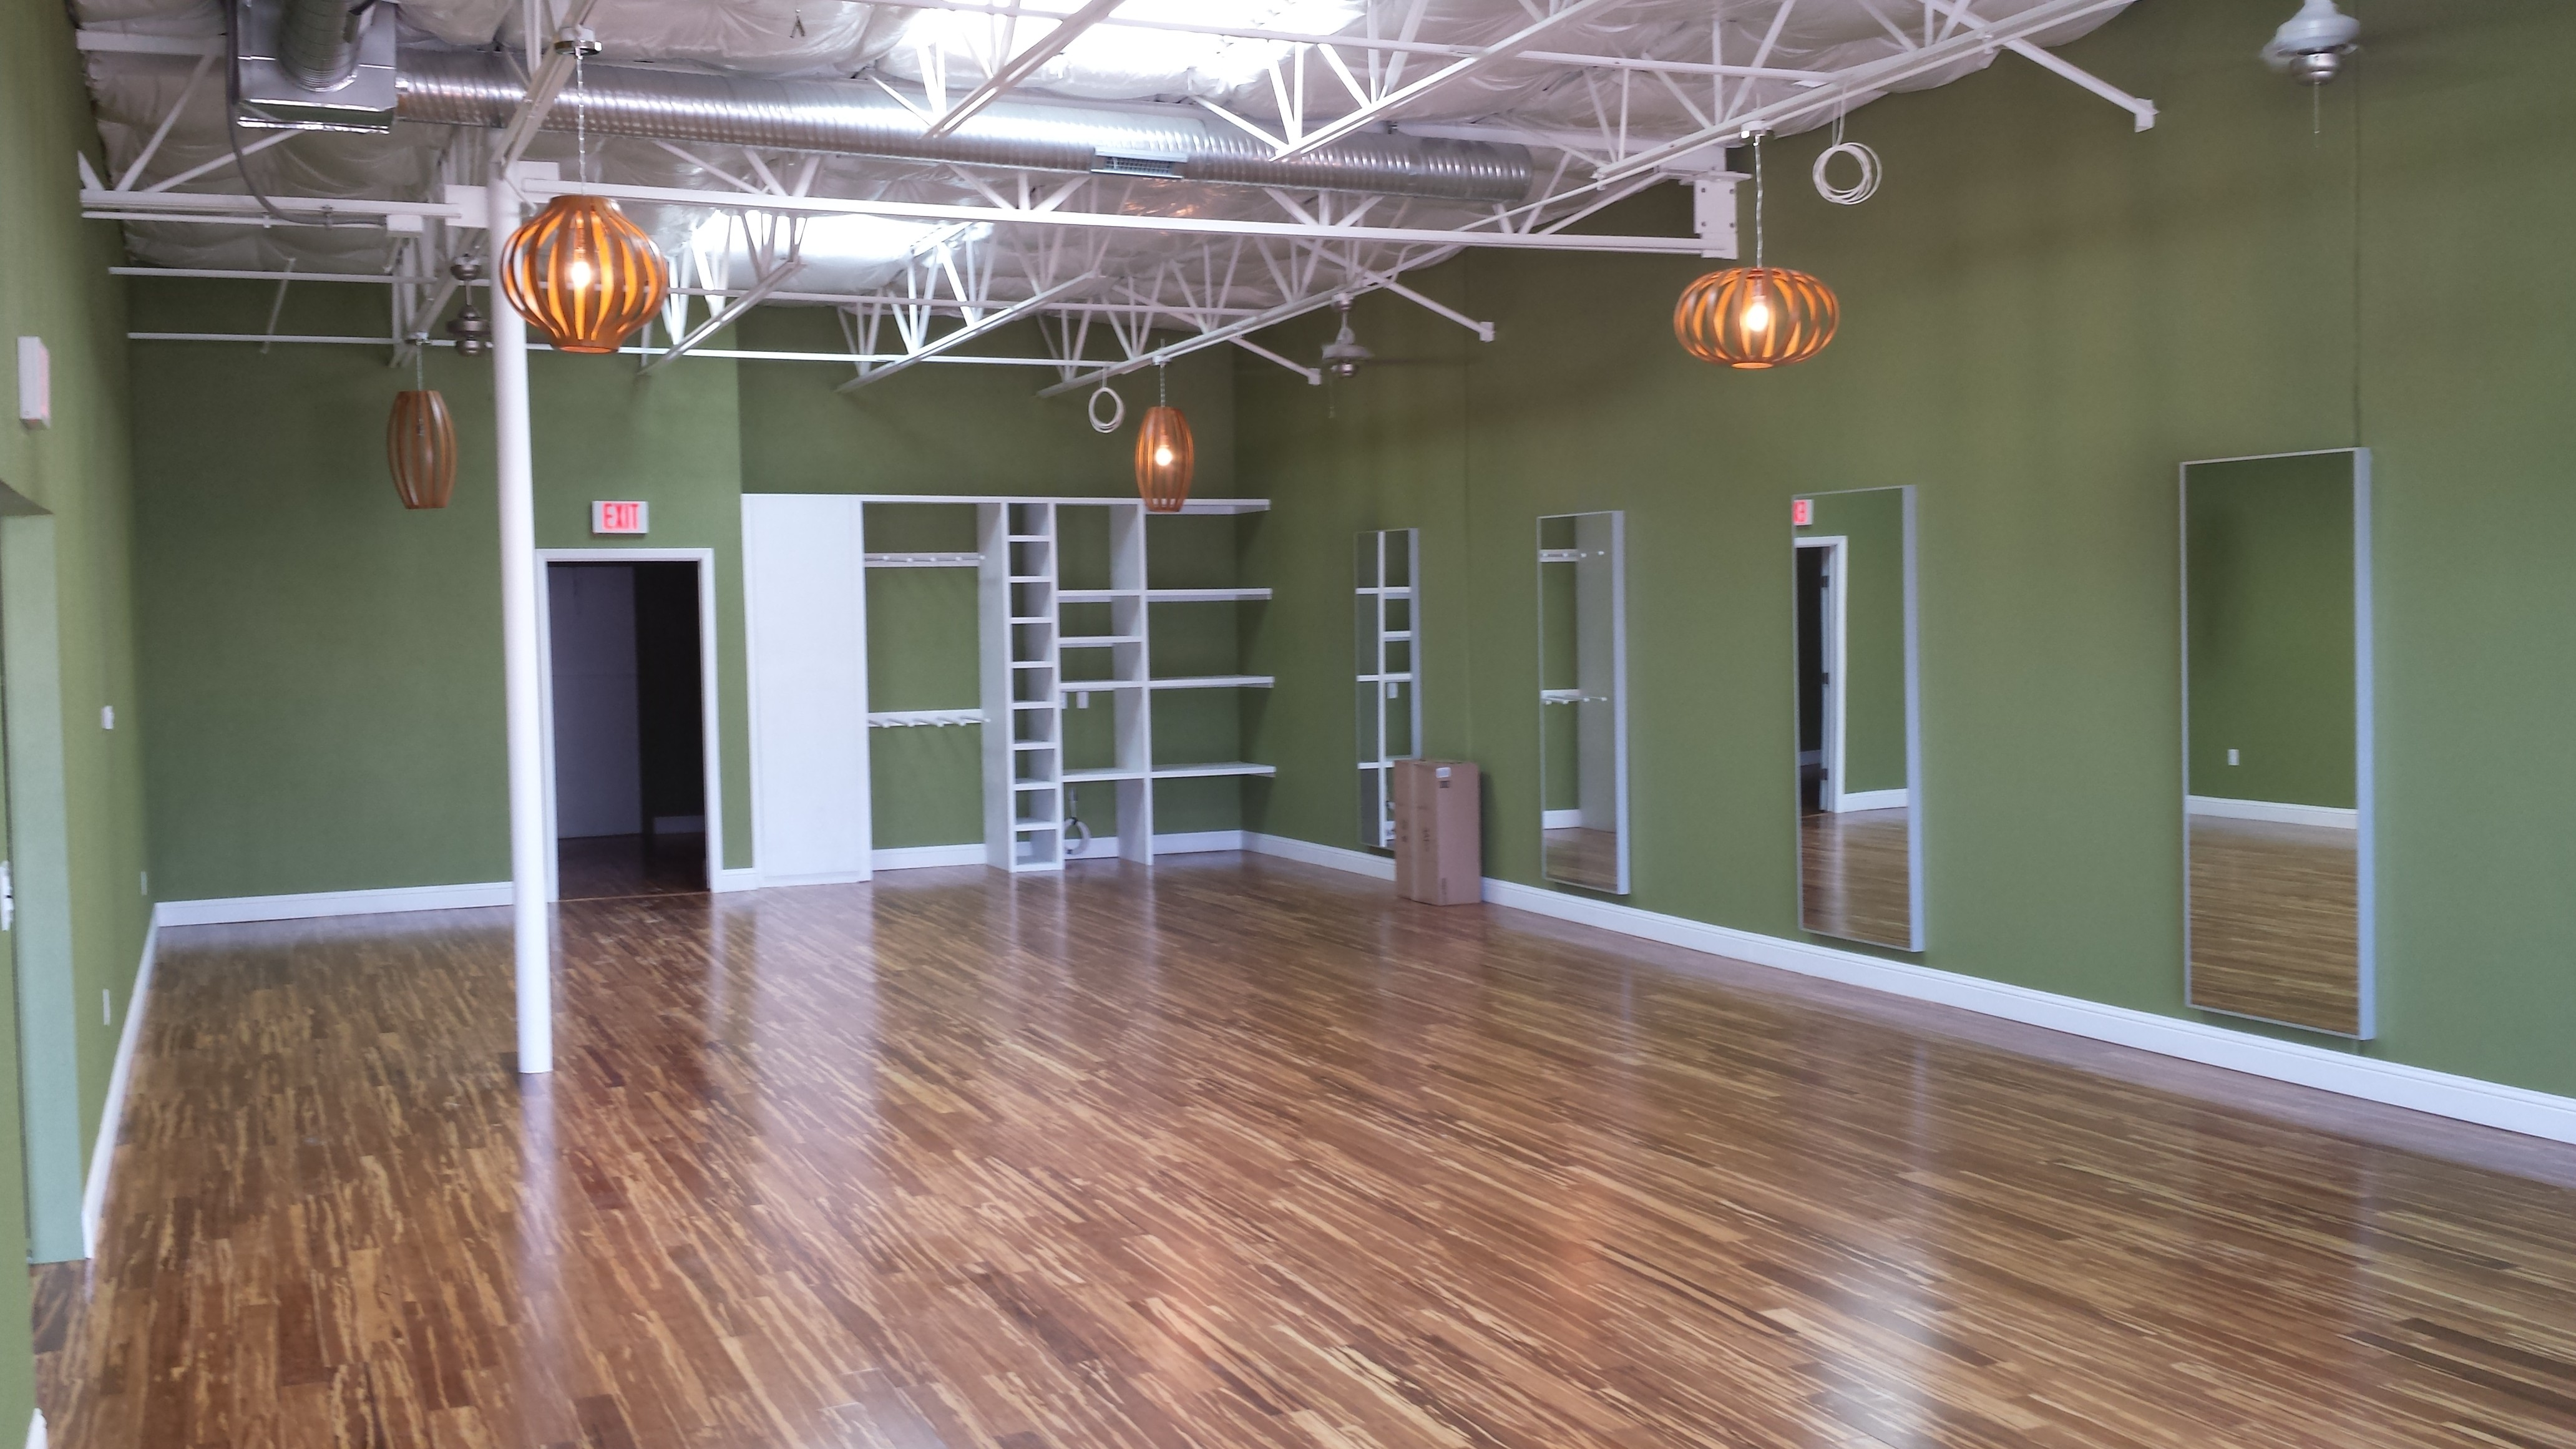 remodeling kitchens & baths | plano | dallas | montfort designs llc